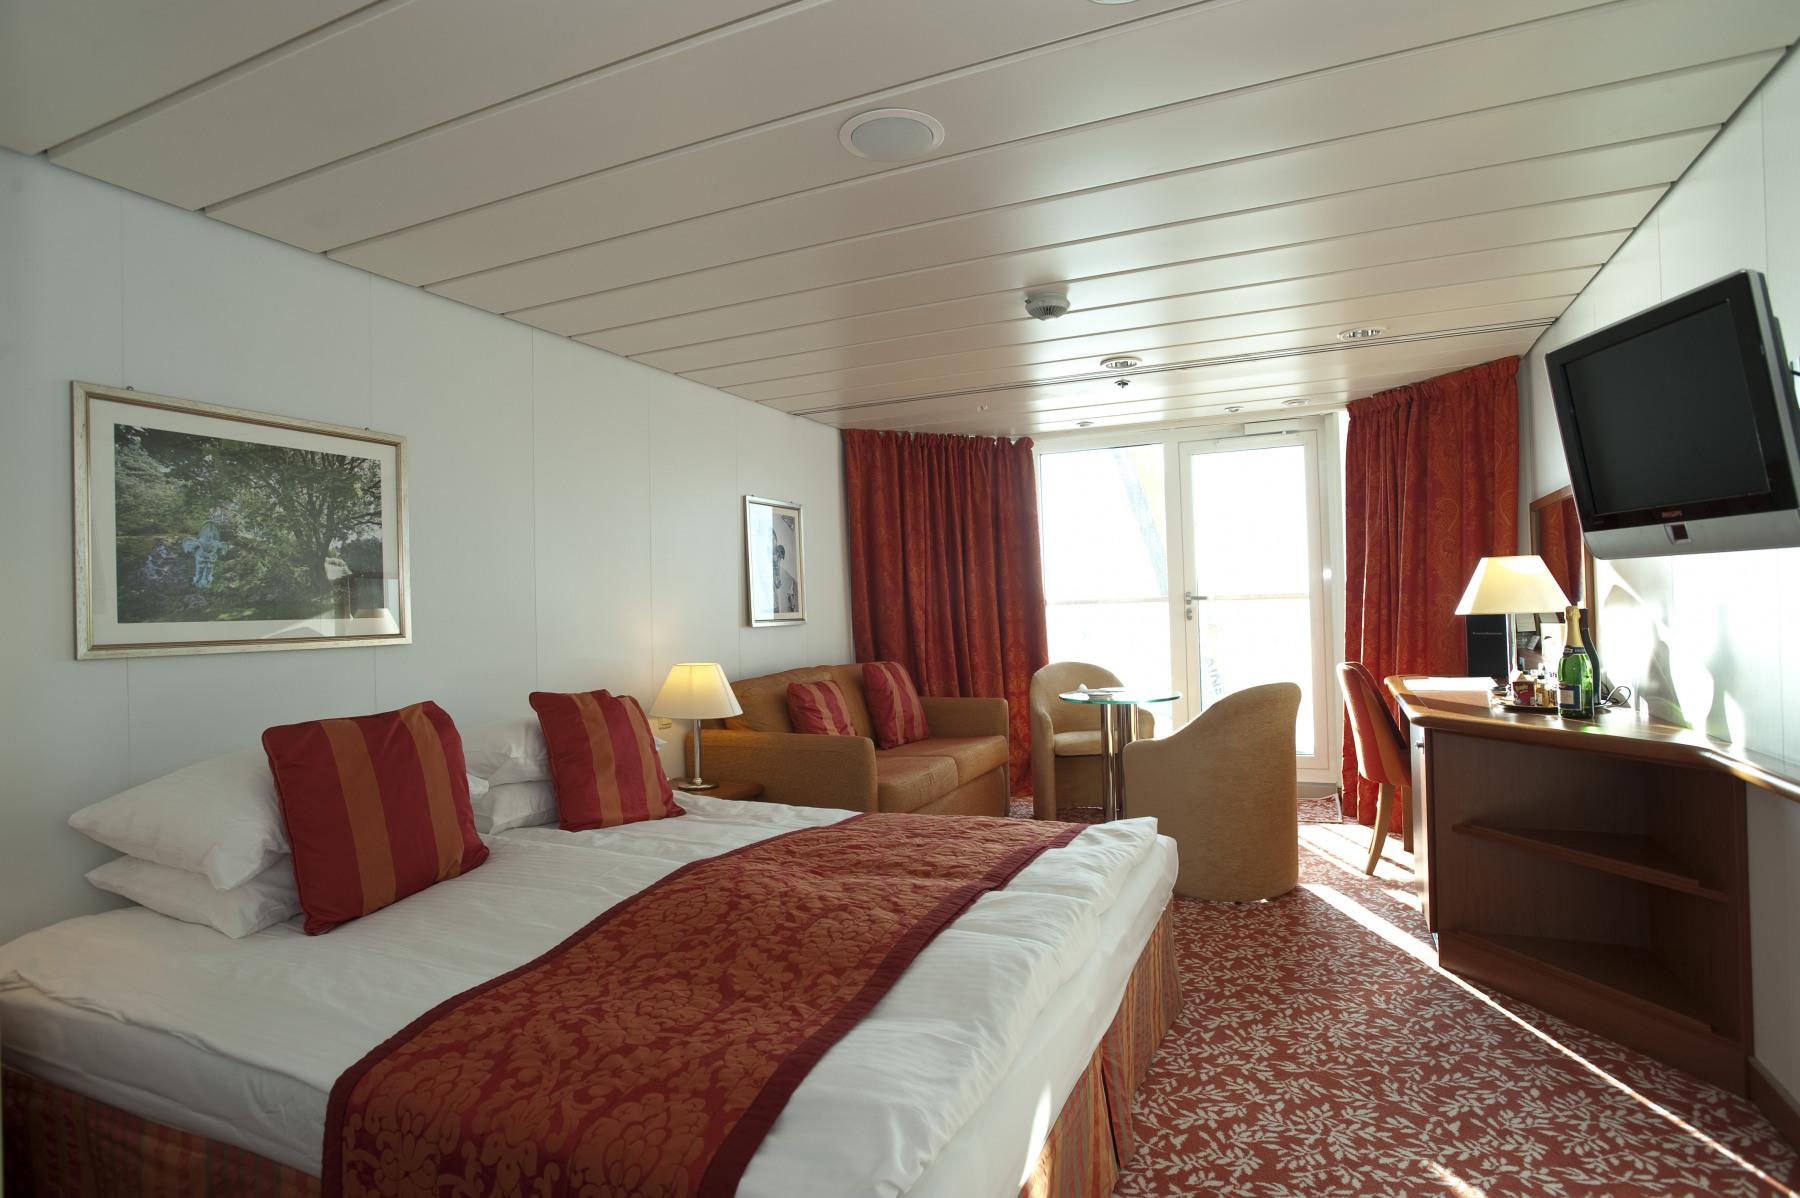 fred olsen cruise lines balmoral suite 2014.jpg